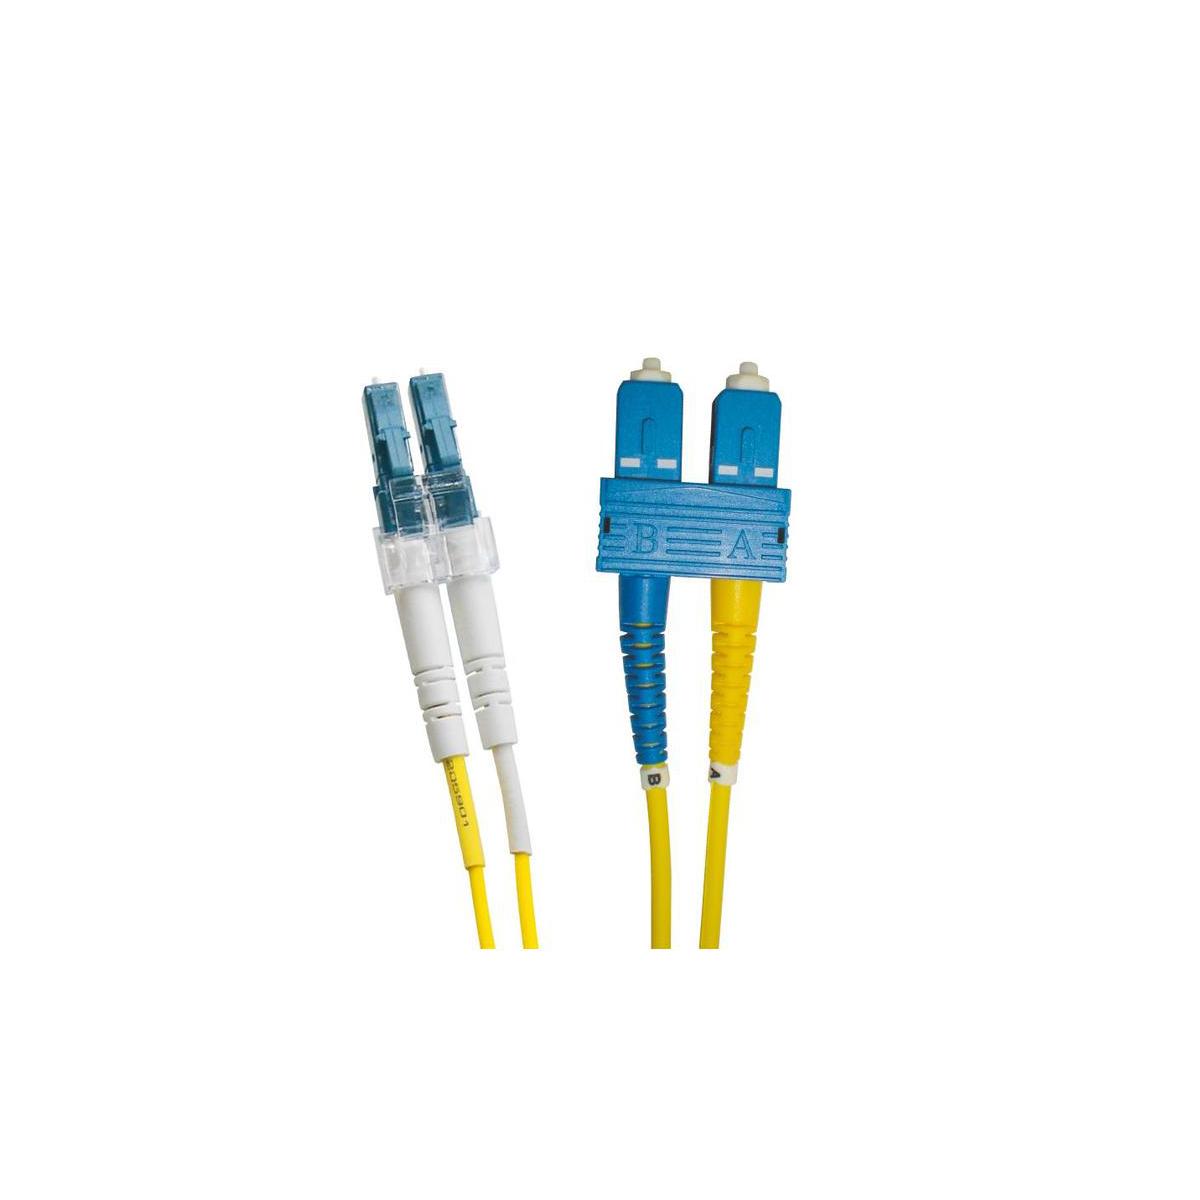 EXCEL OS2 30M LC-SC DUPLEX P/LEAD 9/125